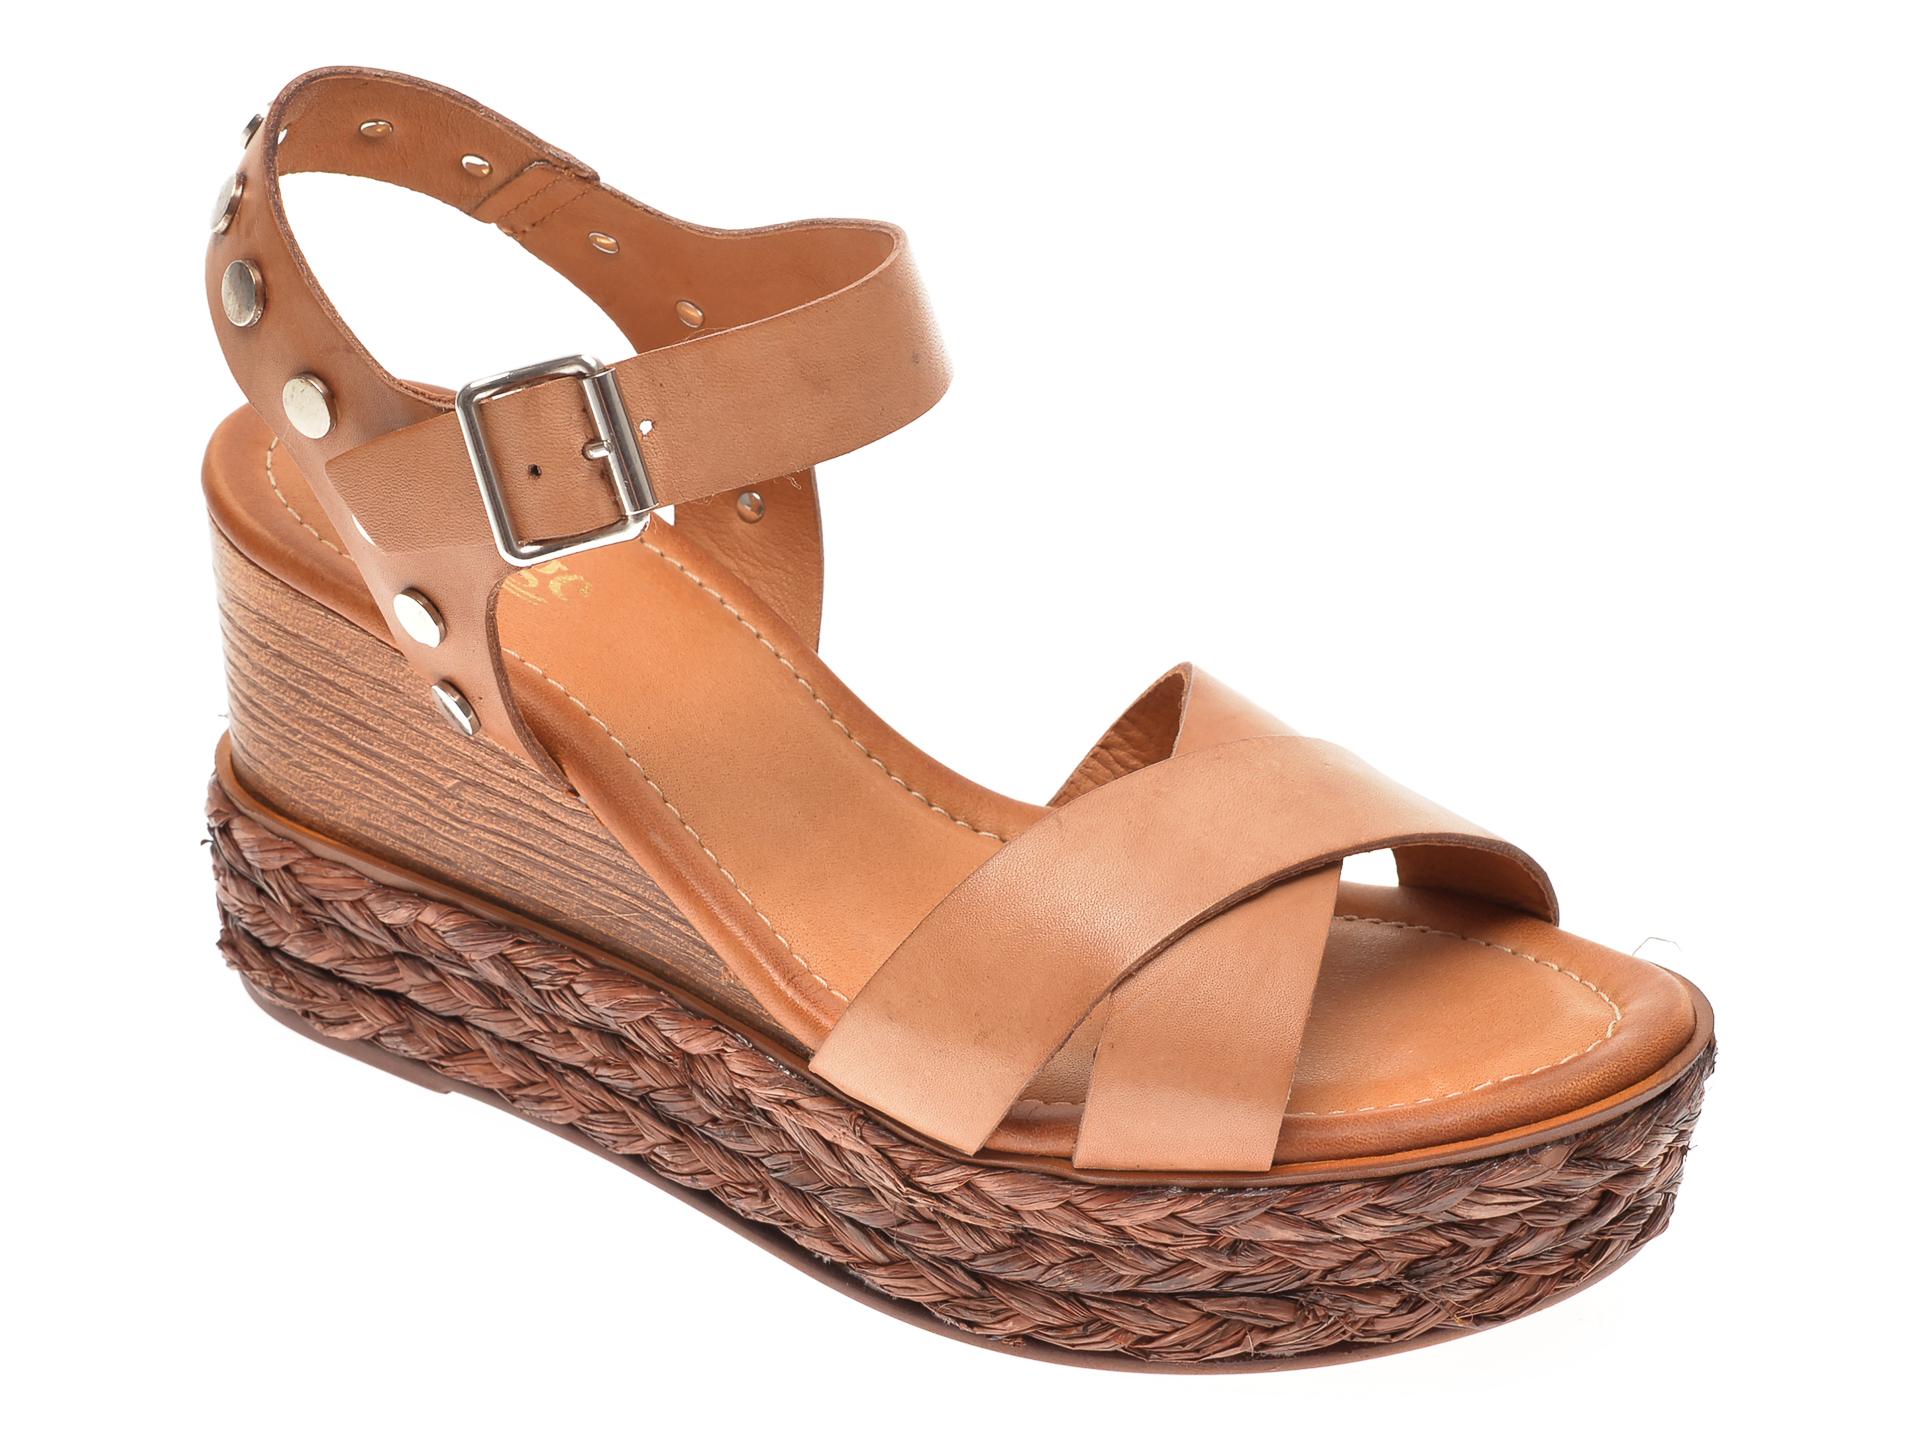 Sandale IMAGE maro, 4147, din piele naturala imagine